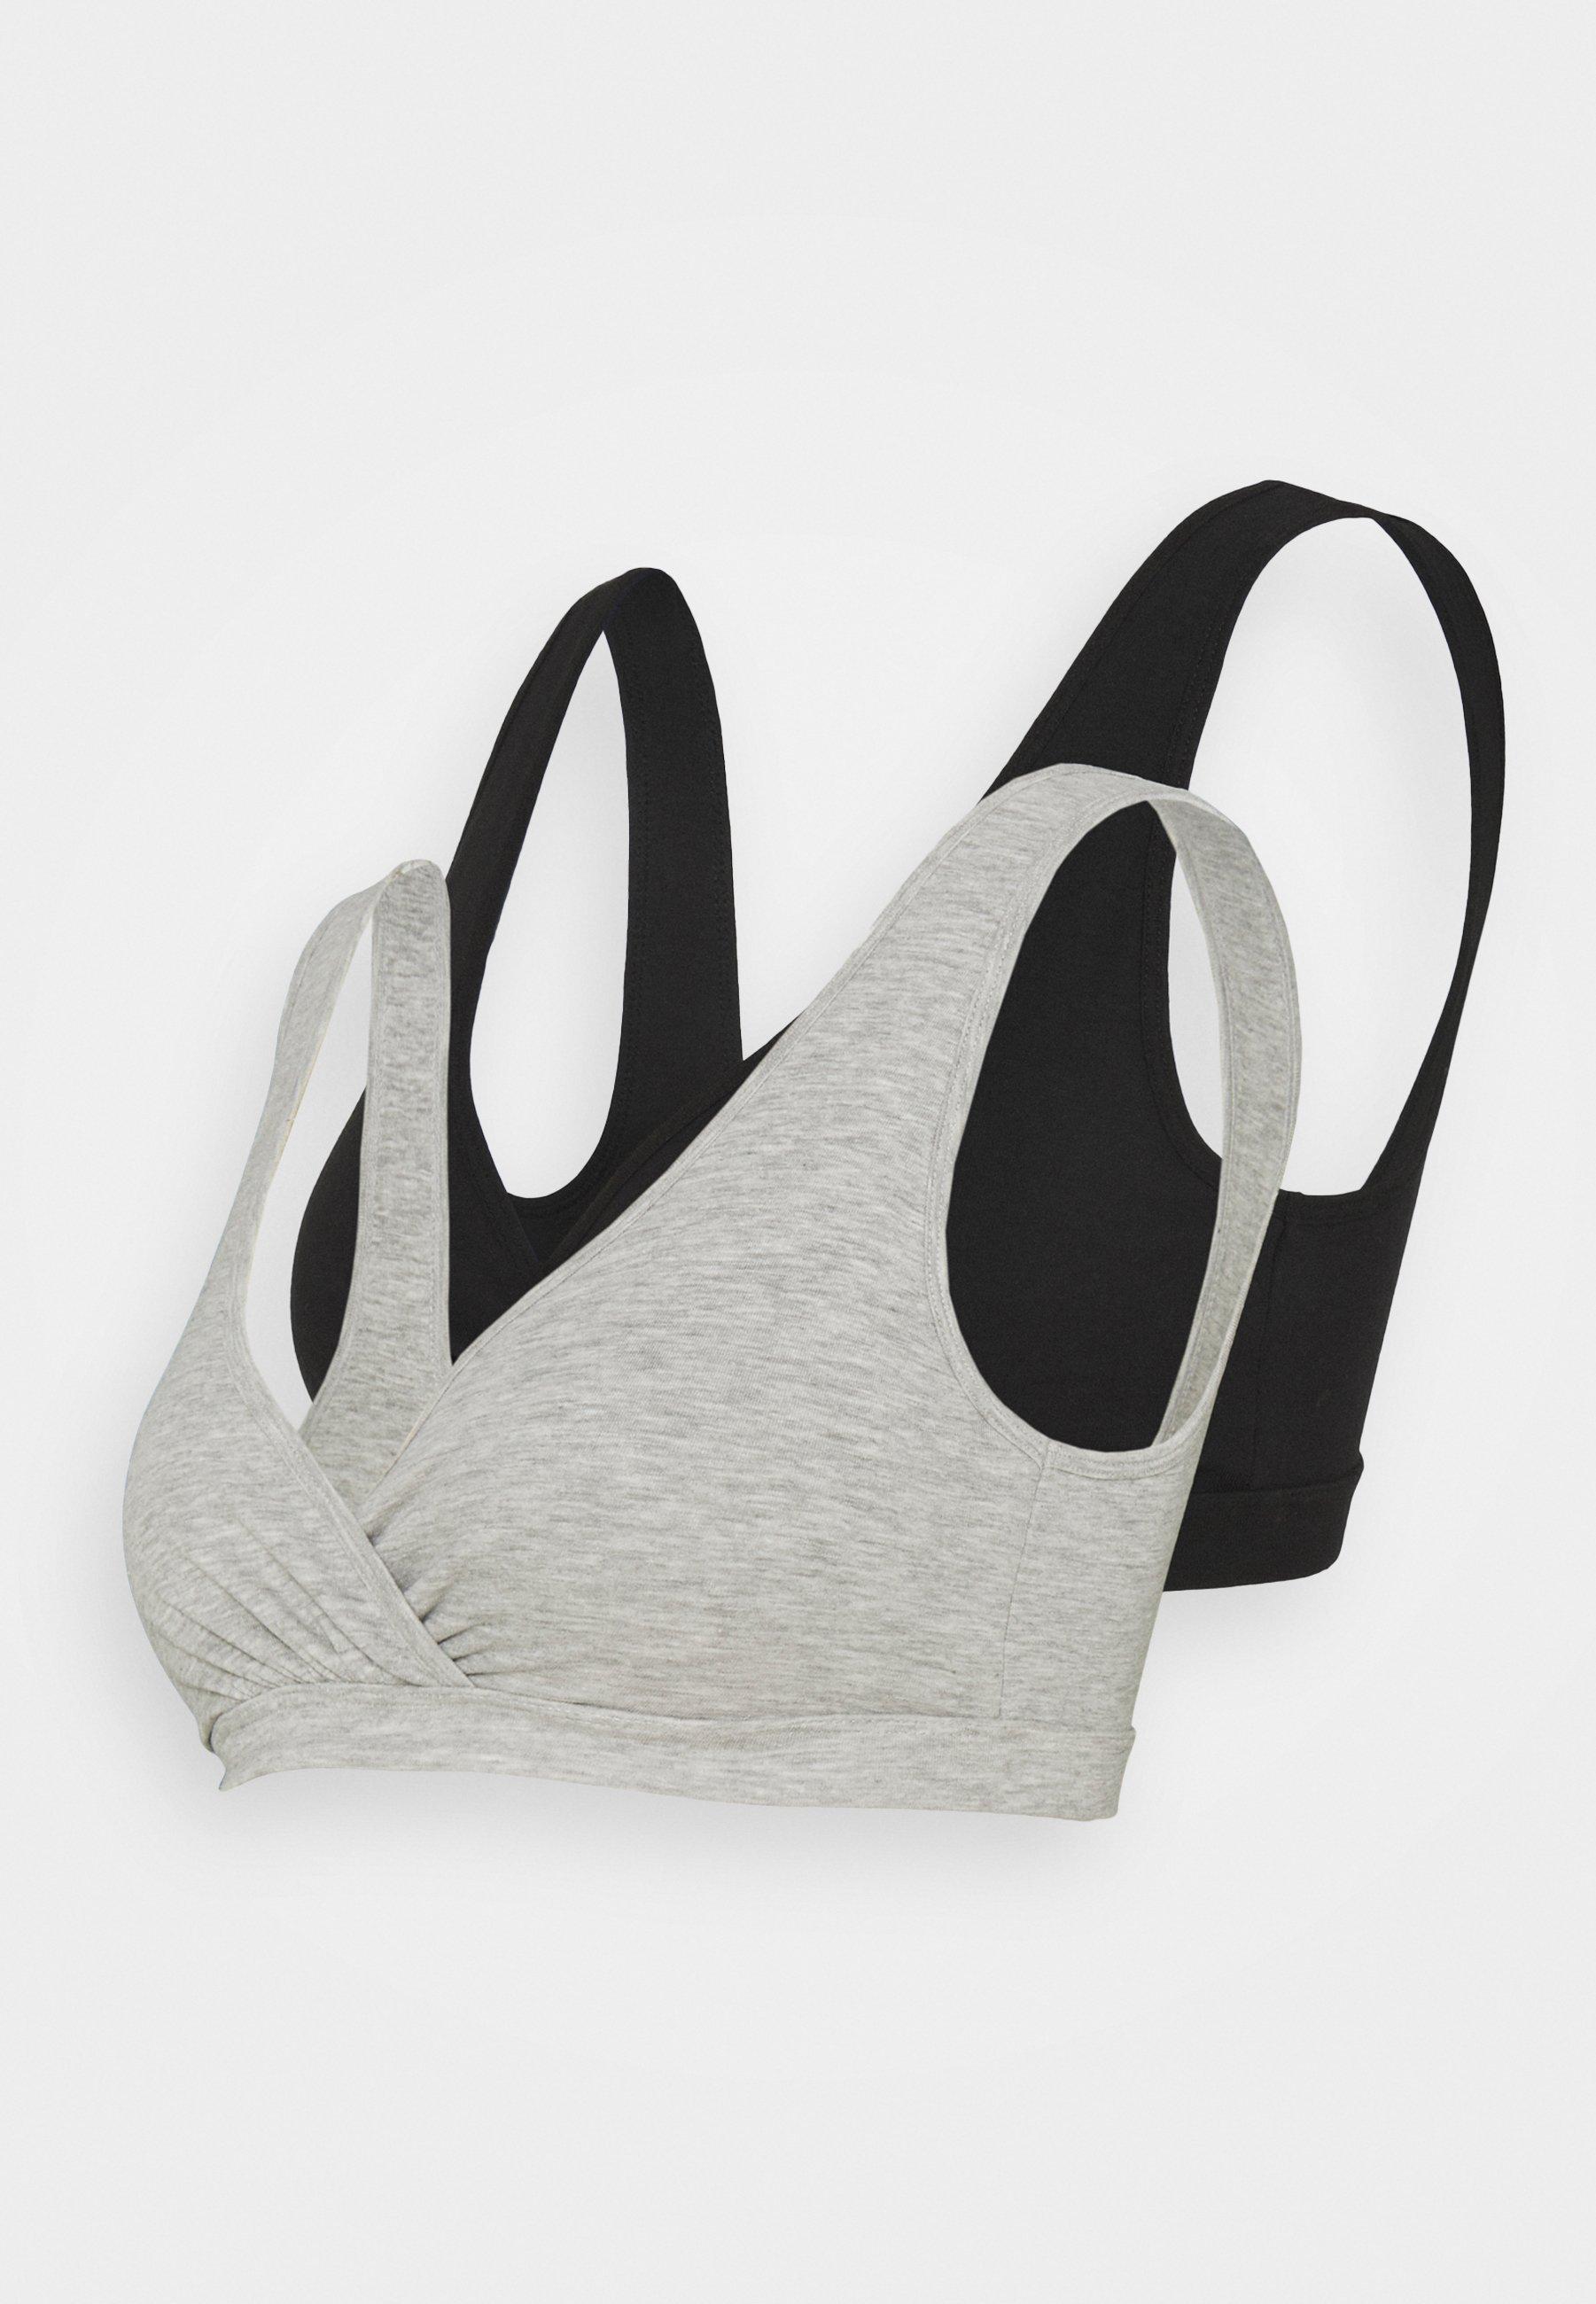 Women WRAP NURSING TOP 2 PACK - Triangle bra